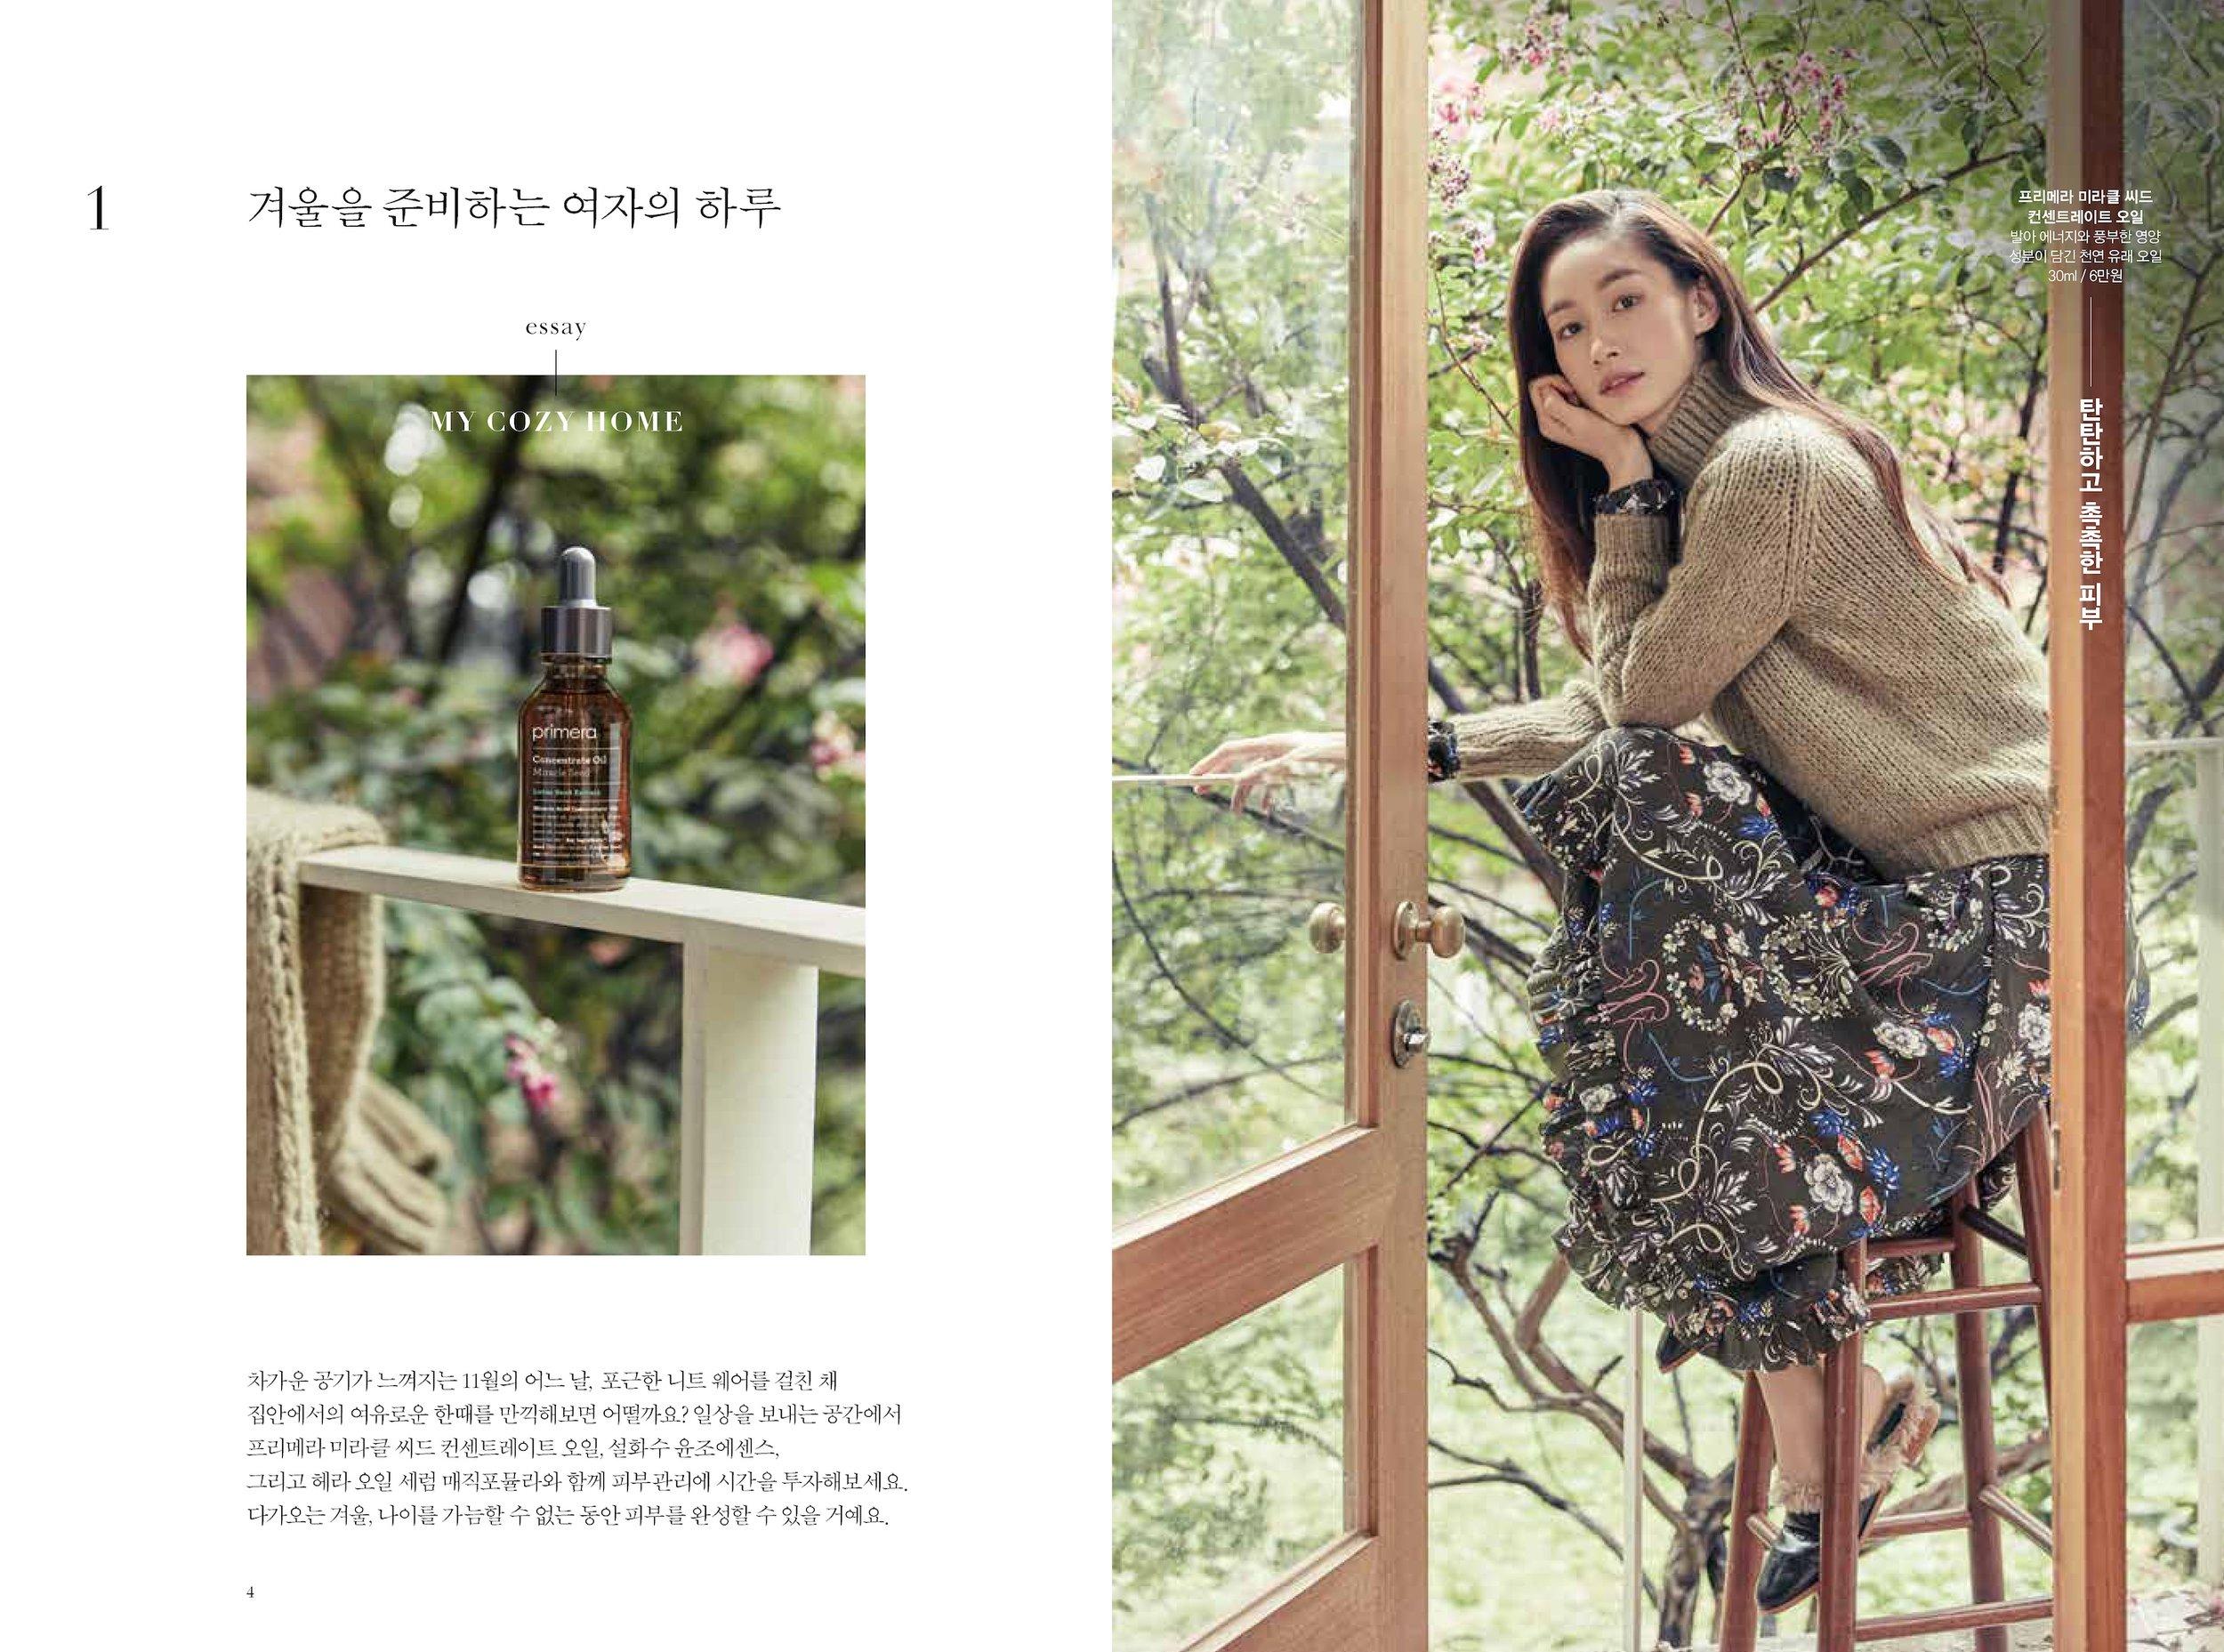 hyangjang-201611_페이지_01.jpeg